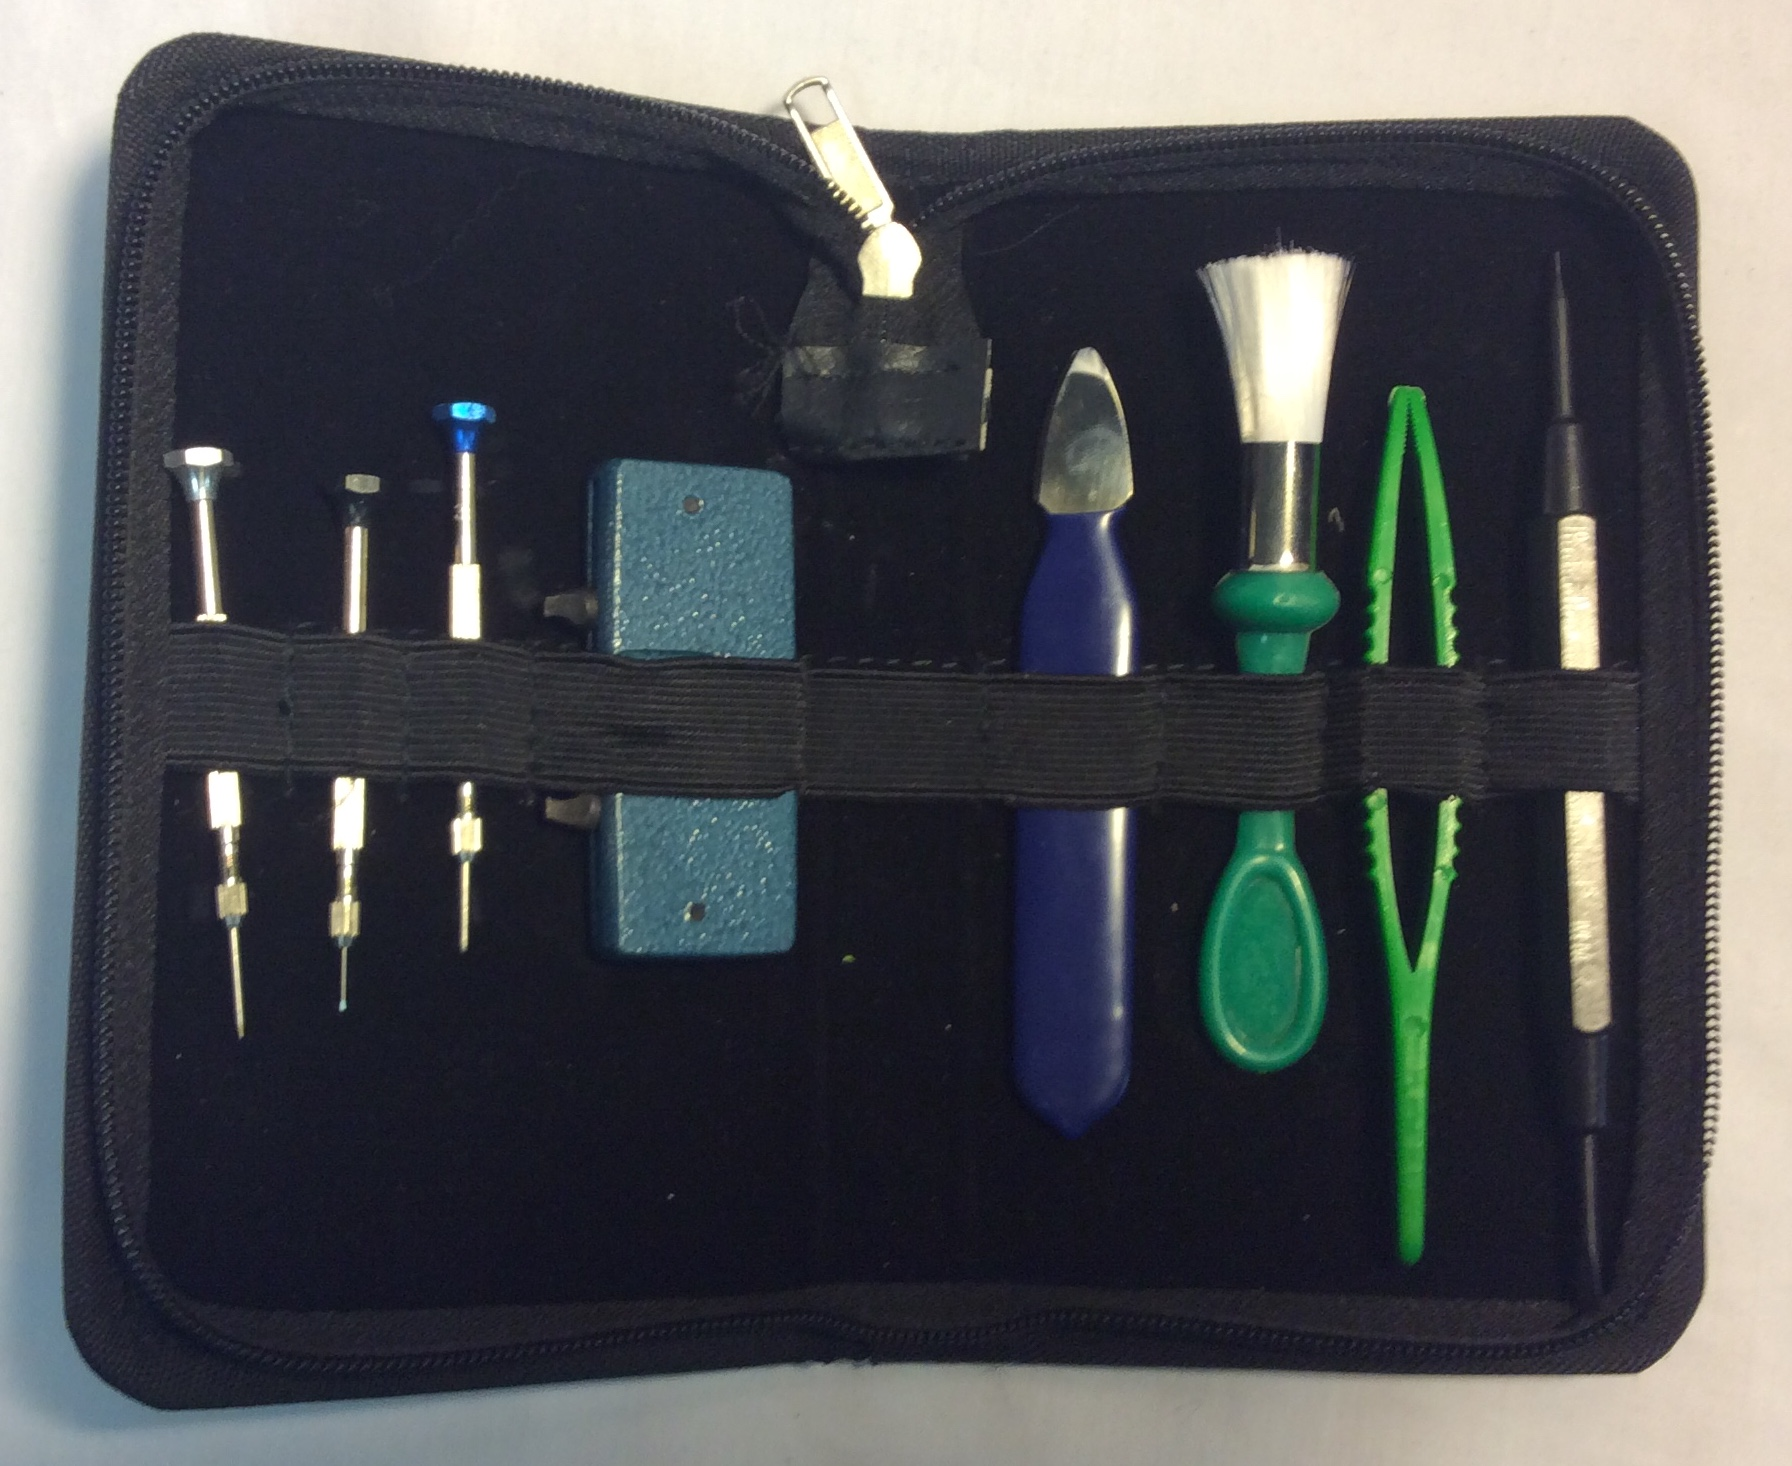 Black zippered watch repair kit